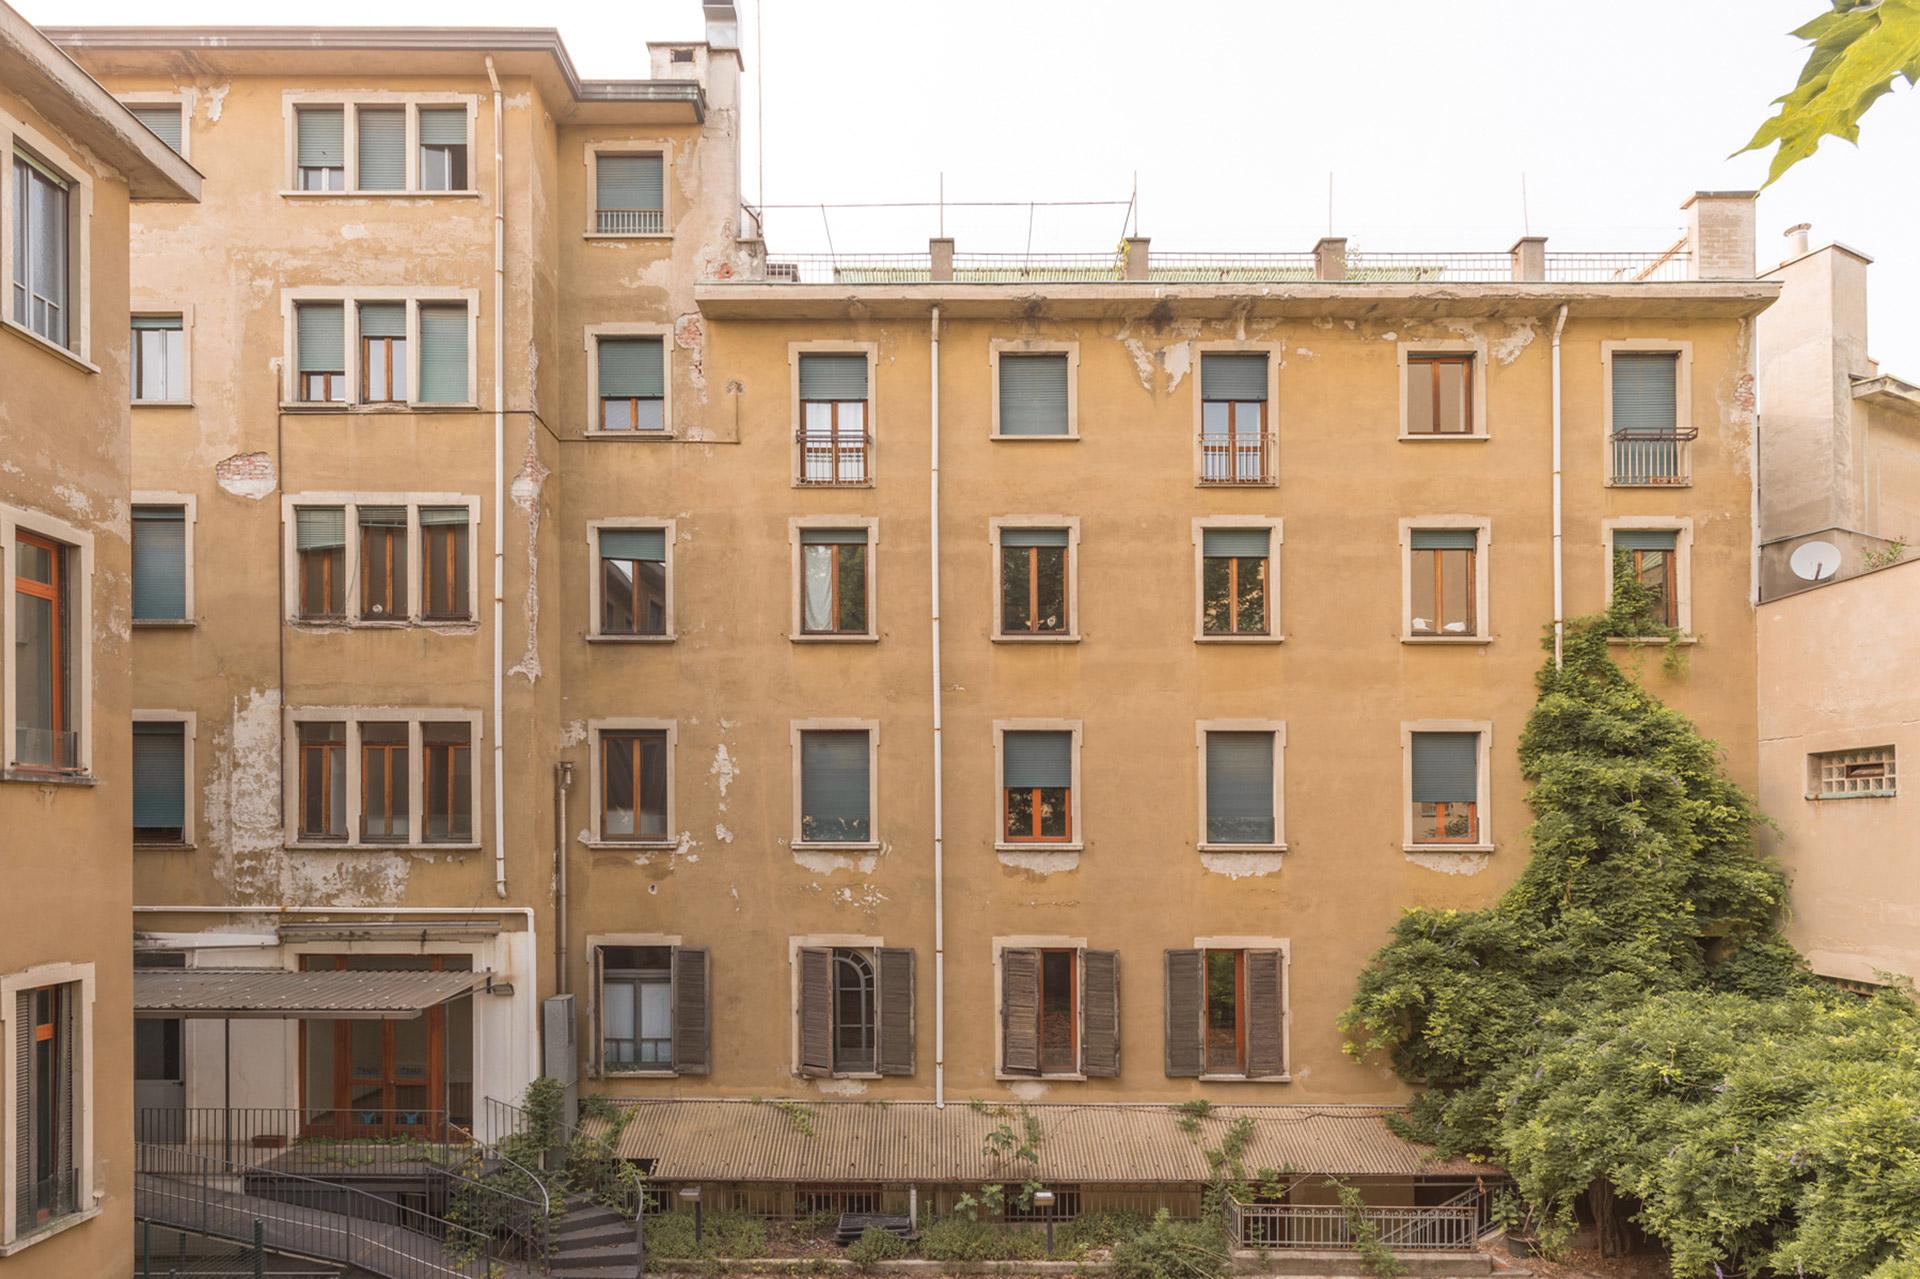 STUDENT HOUSING IN CITTA' STUDI